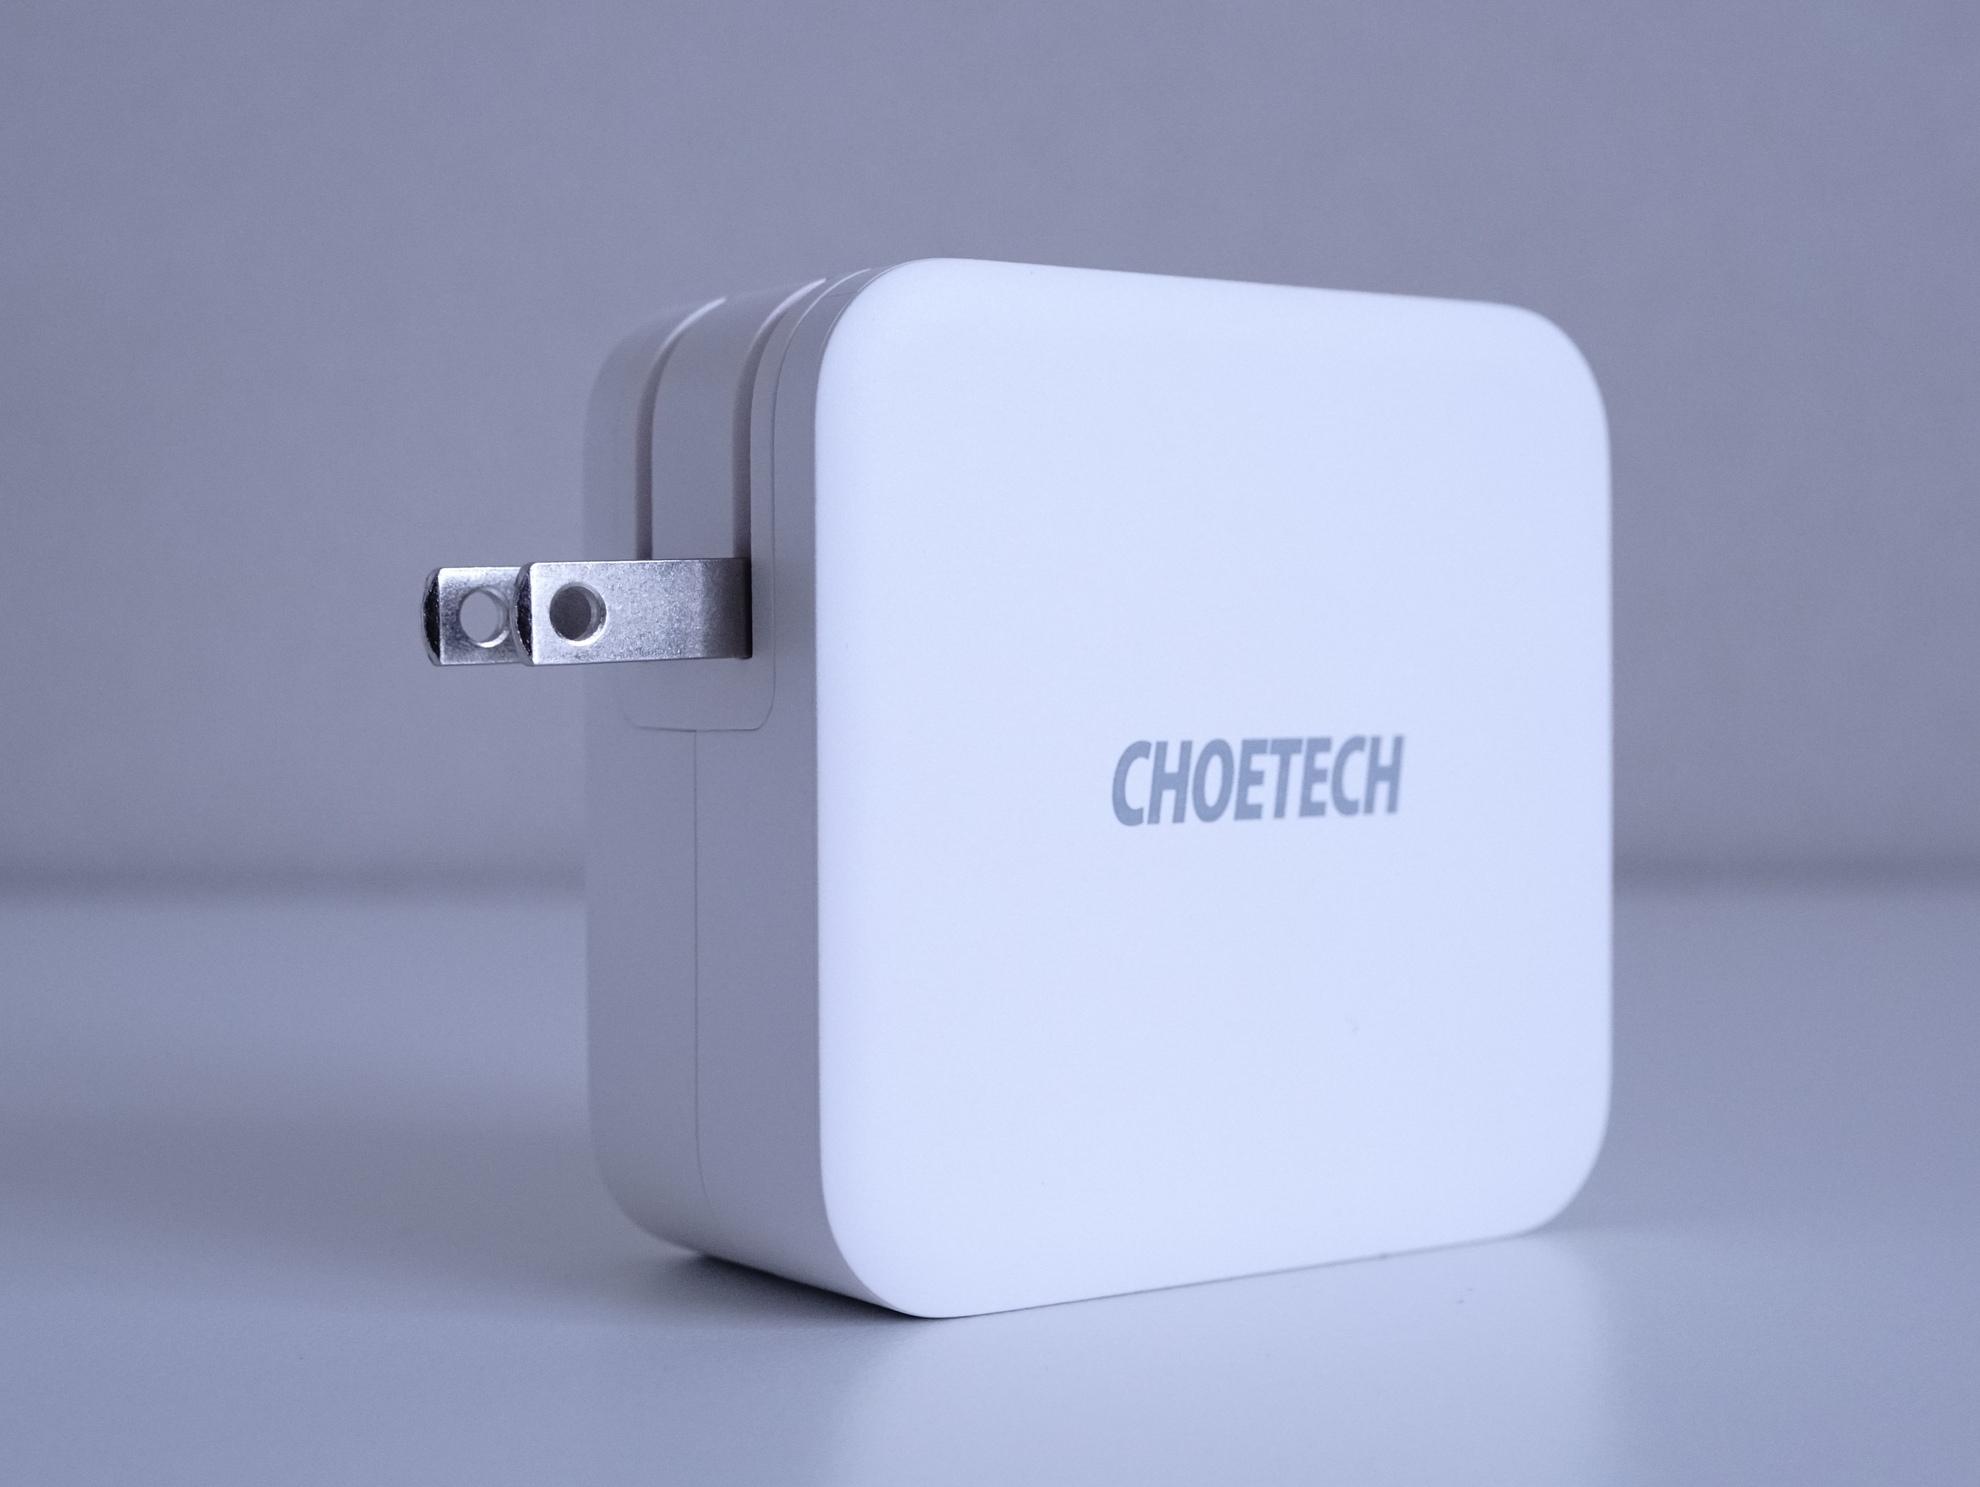 100W対応 CHOETECH PD6008 Type C 急速充電器 レビュー